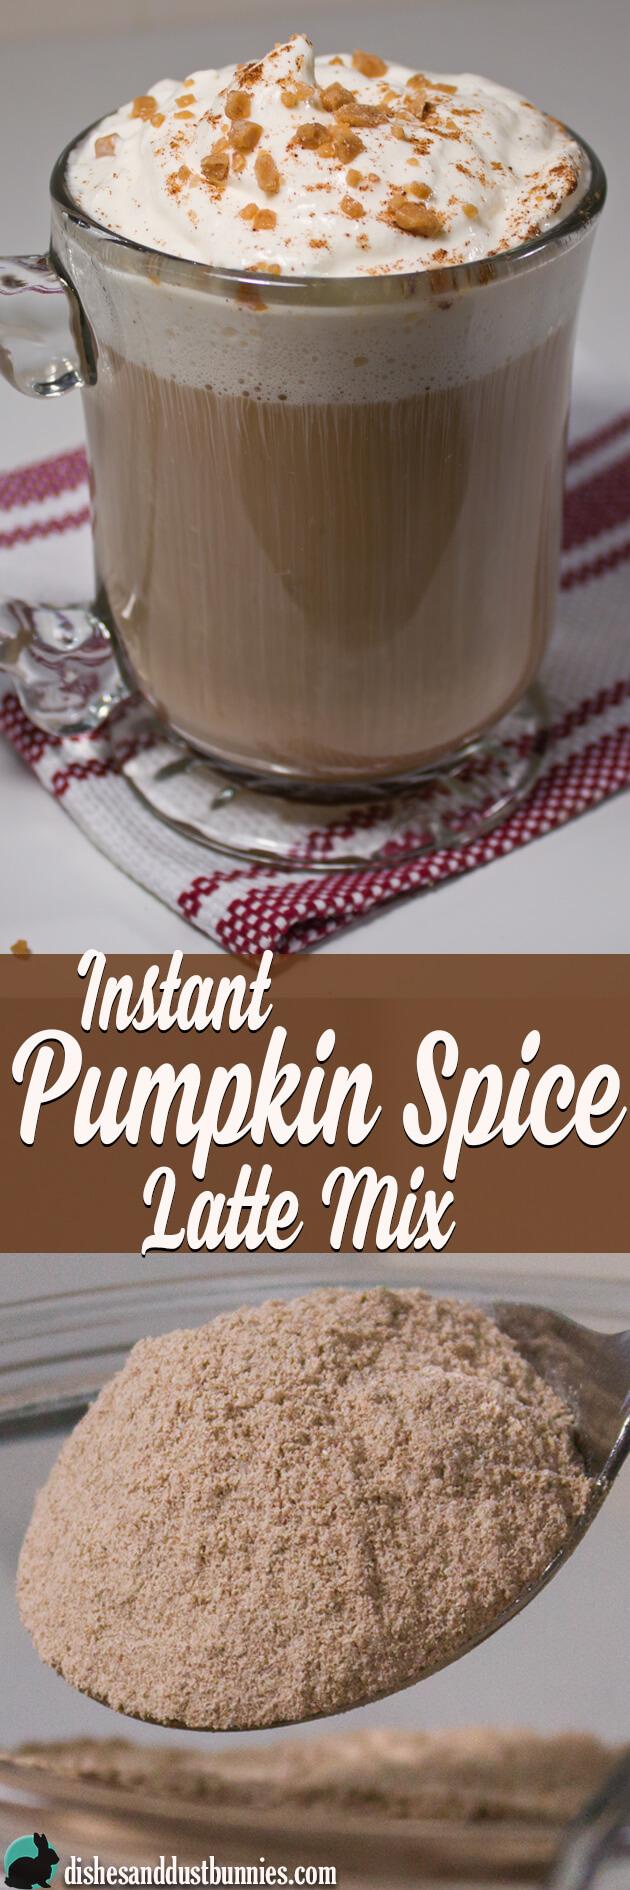 Homemade DIY Instant Pumpkin Spice Latte Mix from dishesanddustbunnies.com